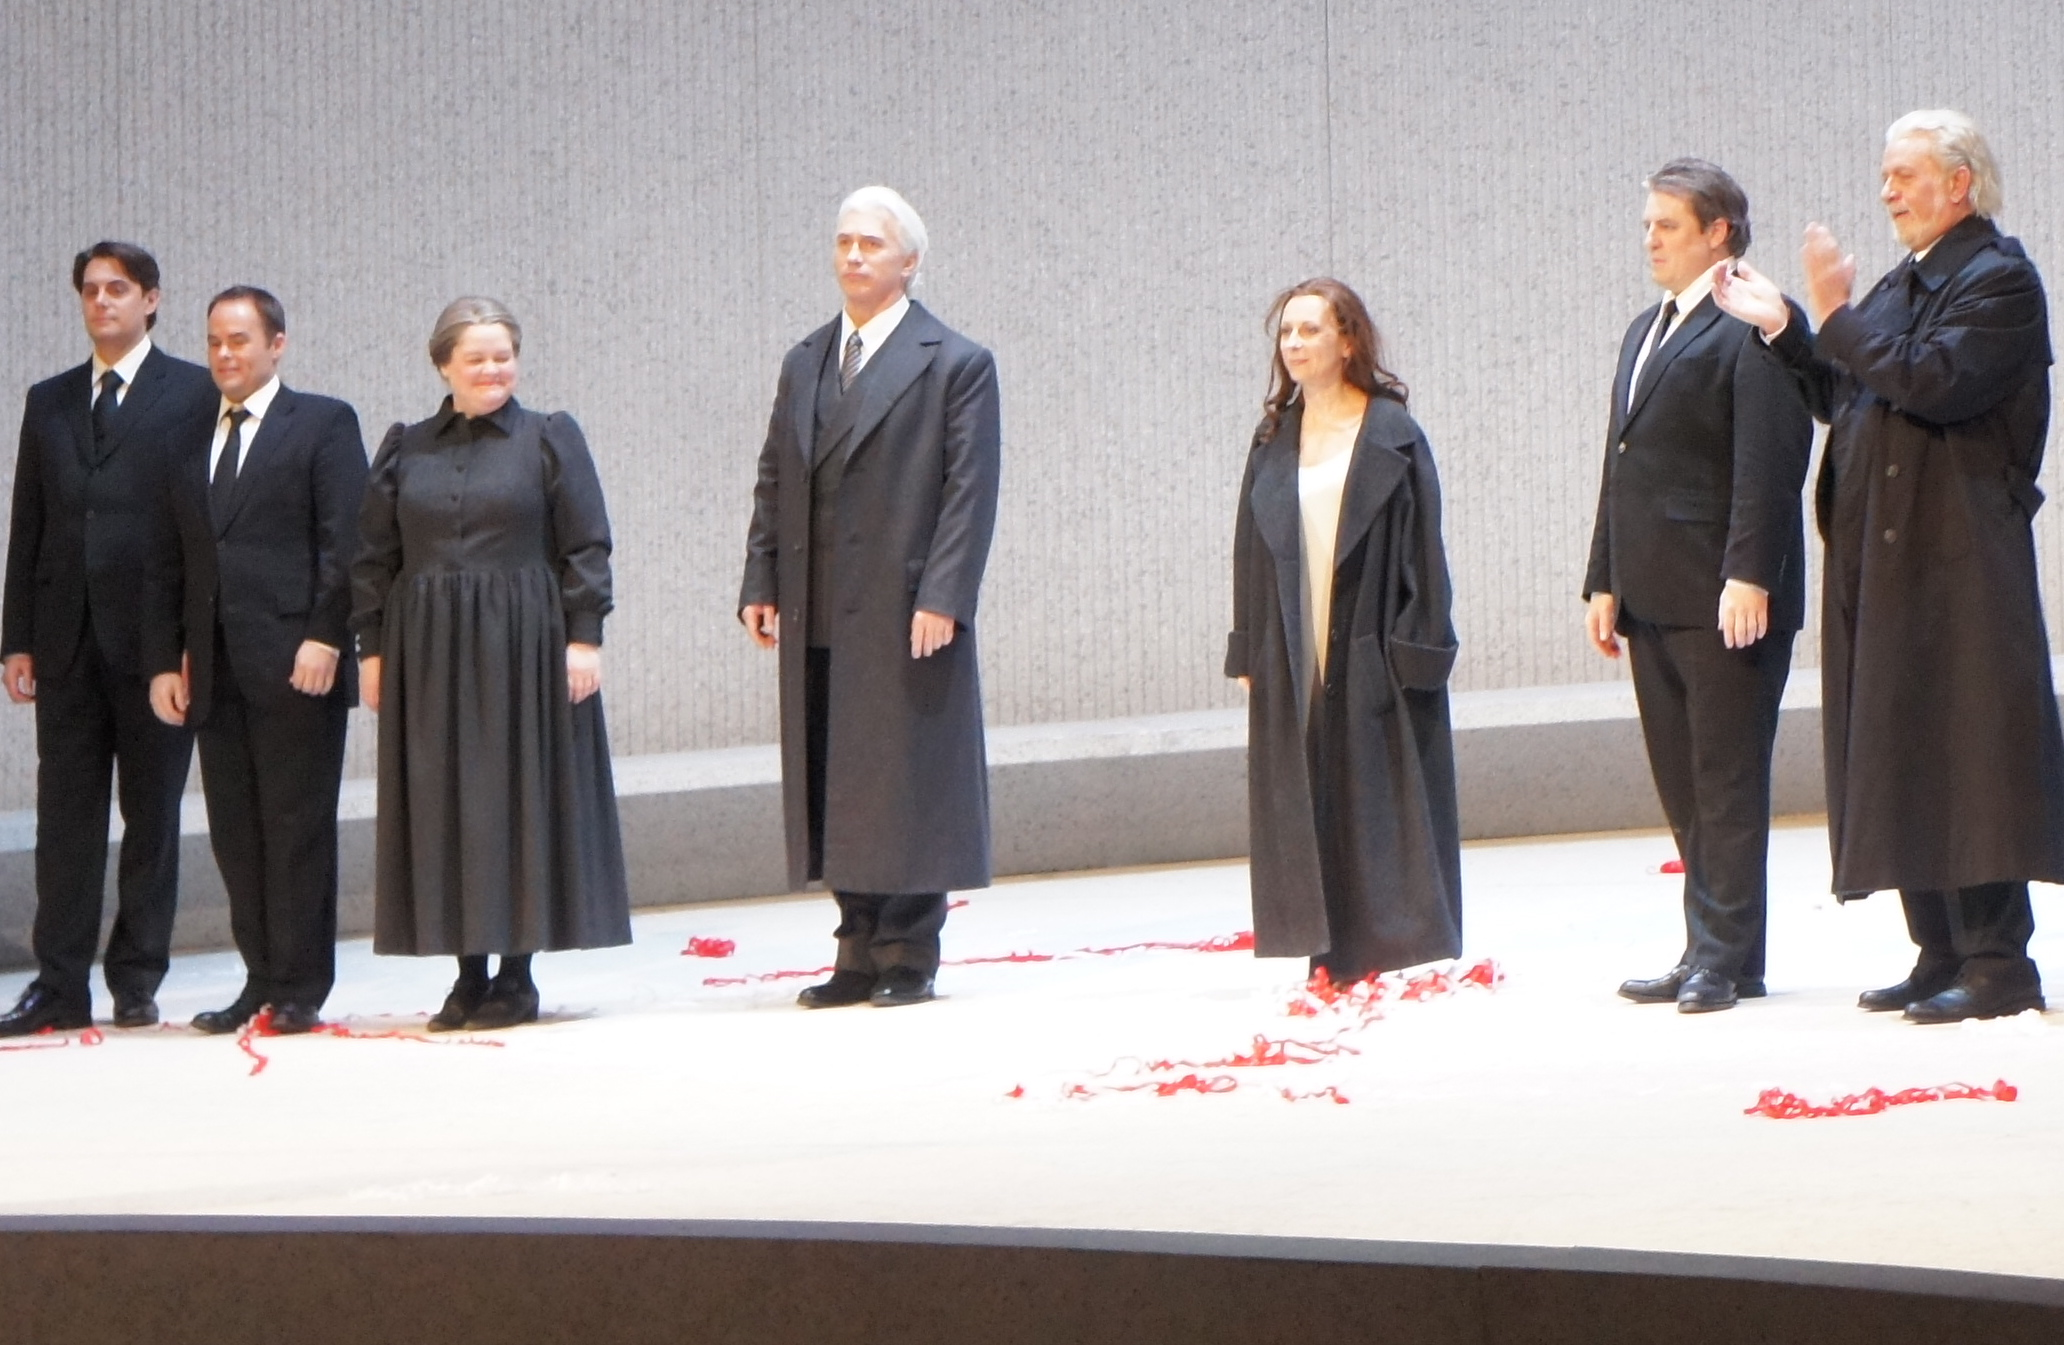 https://simonparrismaninchair.files.wordpress.com/2012/04/met-opera-la-traviata-hvorostovsky-dessay-polenzani-1.jpg